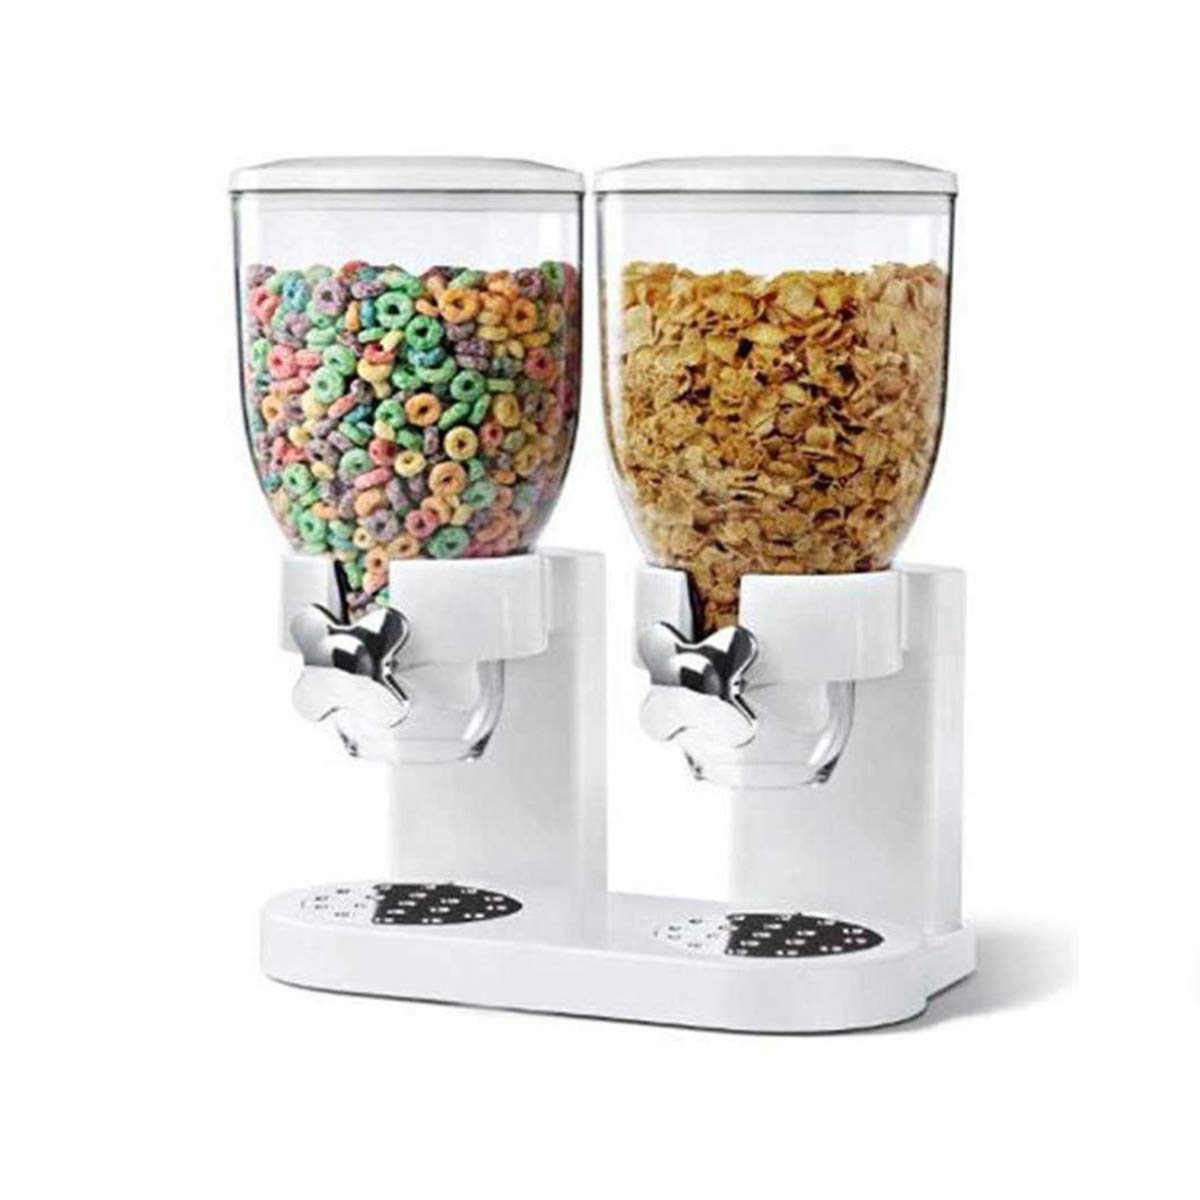 LYEJM Double Cereal Dry Food Dispenser Kitchen Storage Container Kitchen Dry Provisions Dispense Machine LYEJM (Color : Color White)